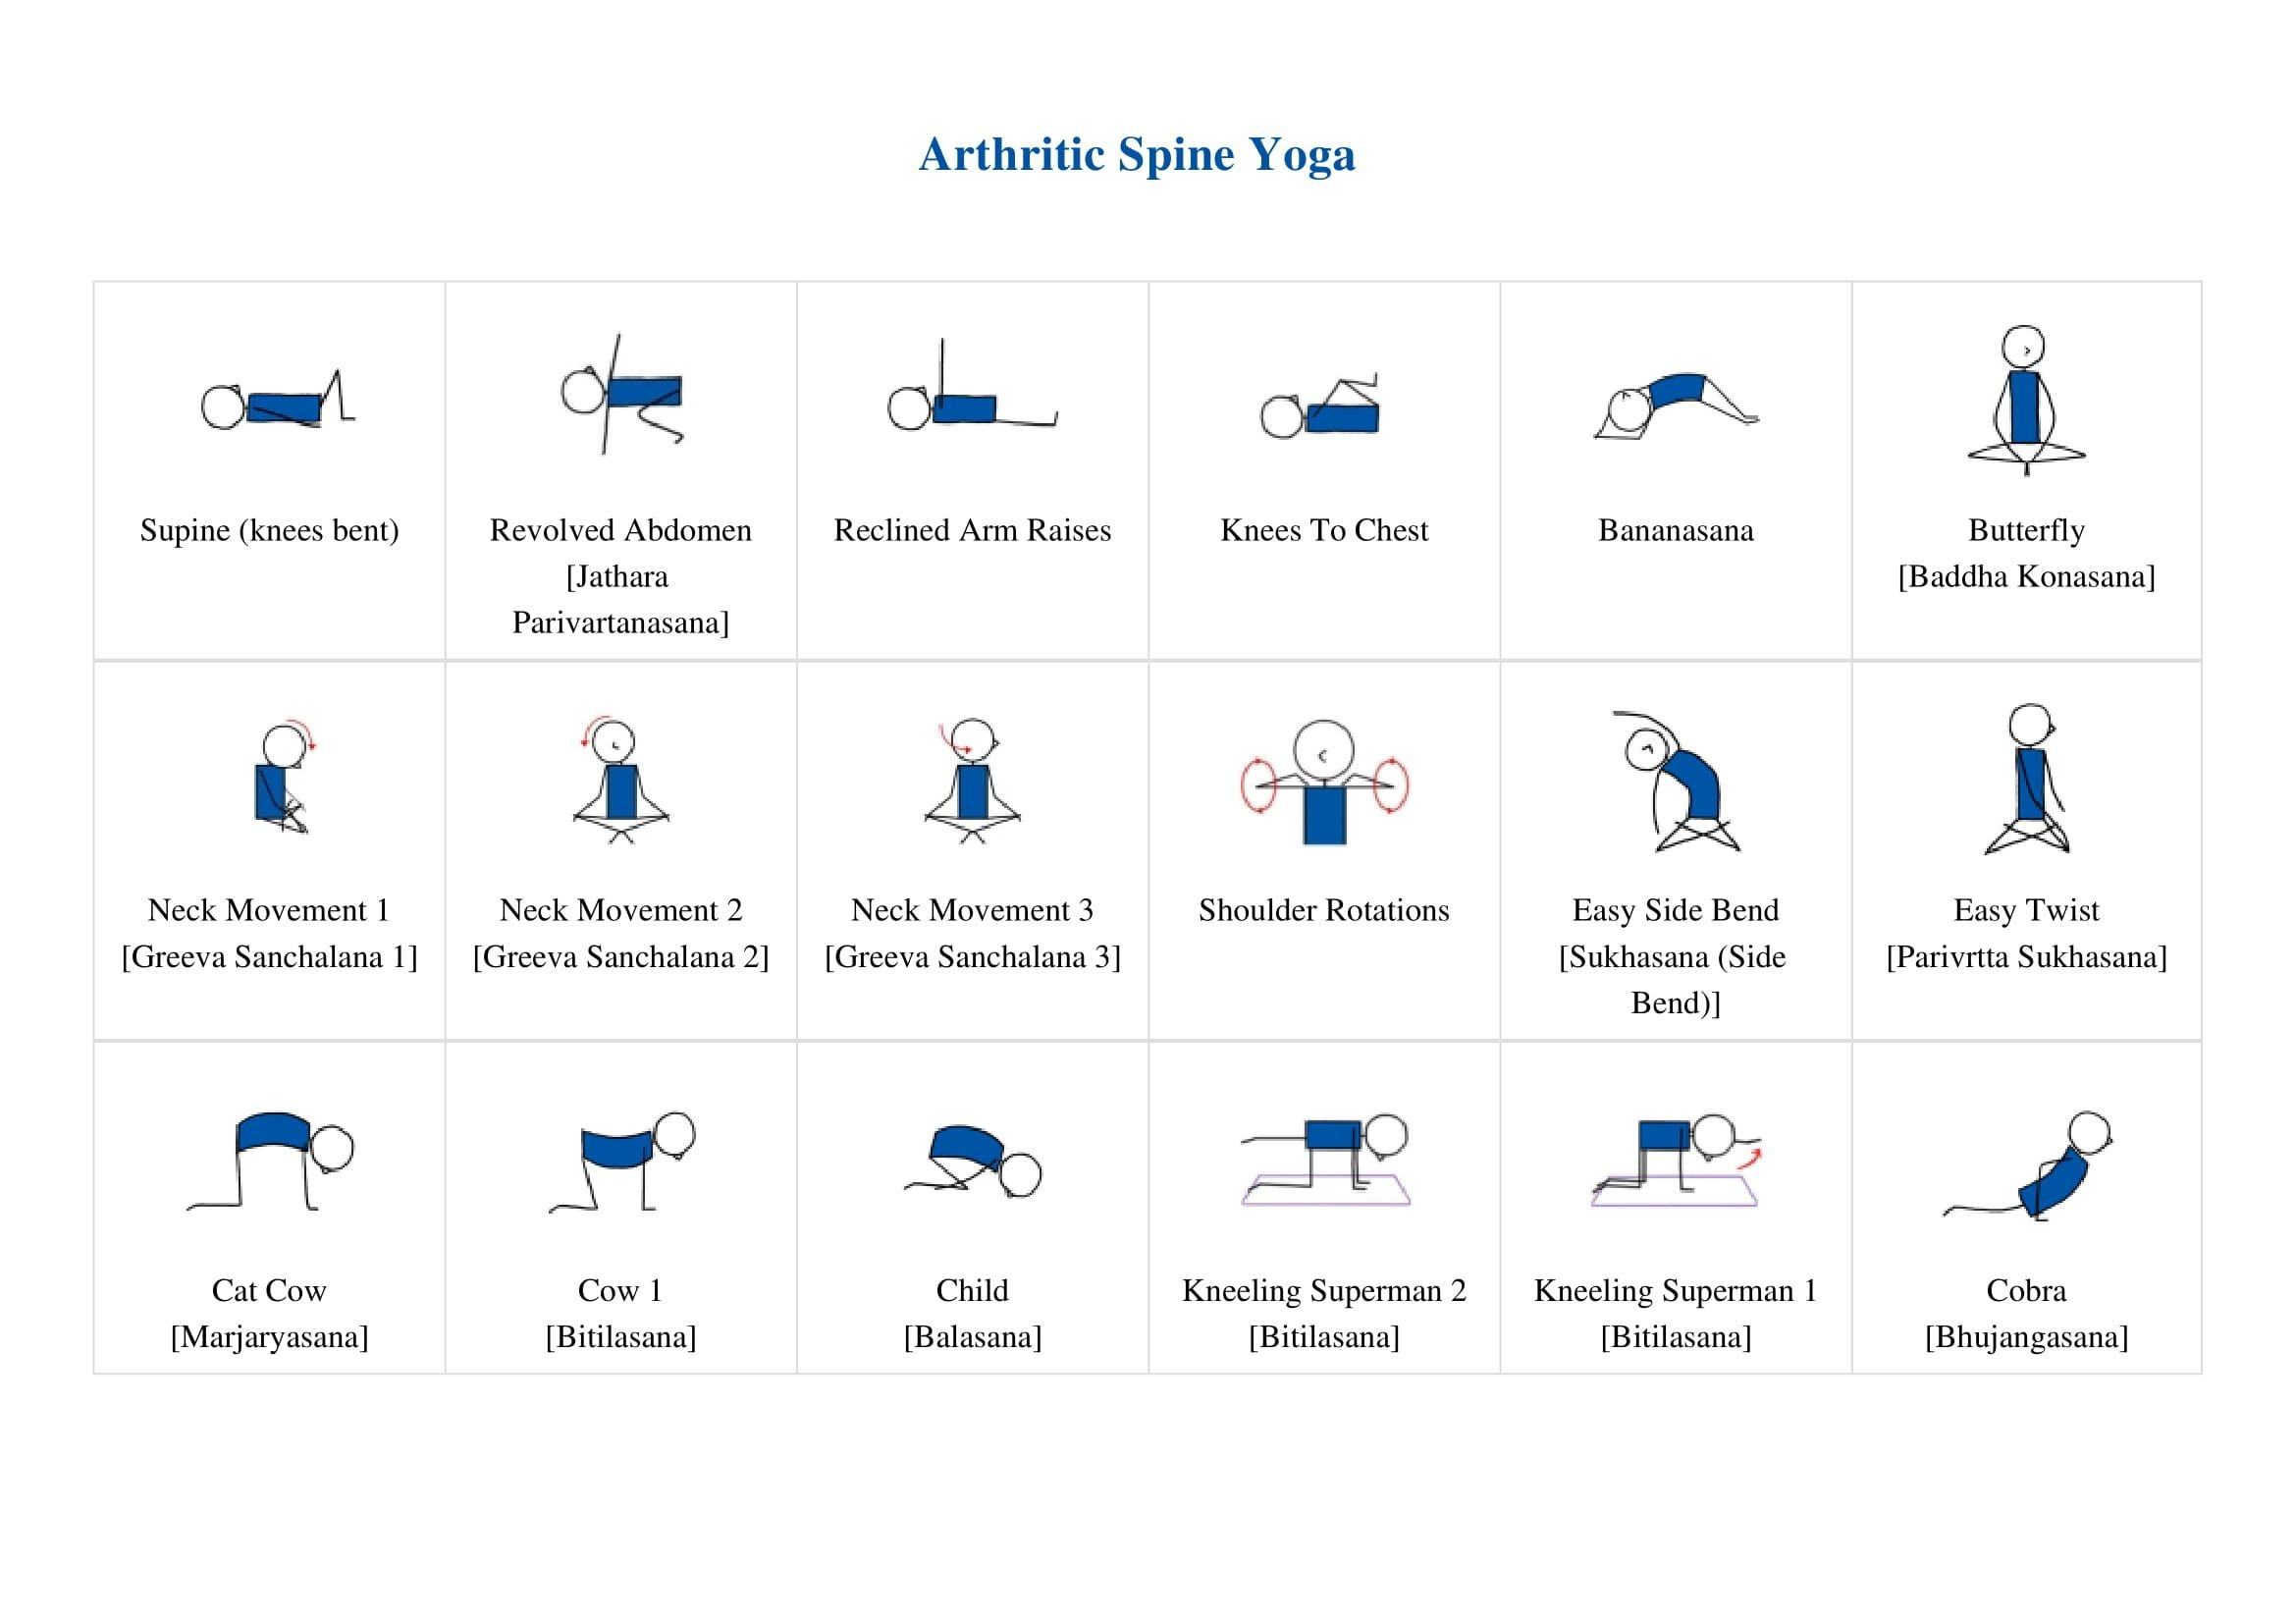 downloadable yoga lesson plan template  Free Downloadable Yoga Lesson Plan For Arthritic Spine ..